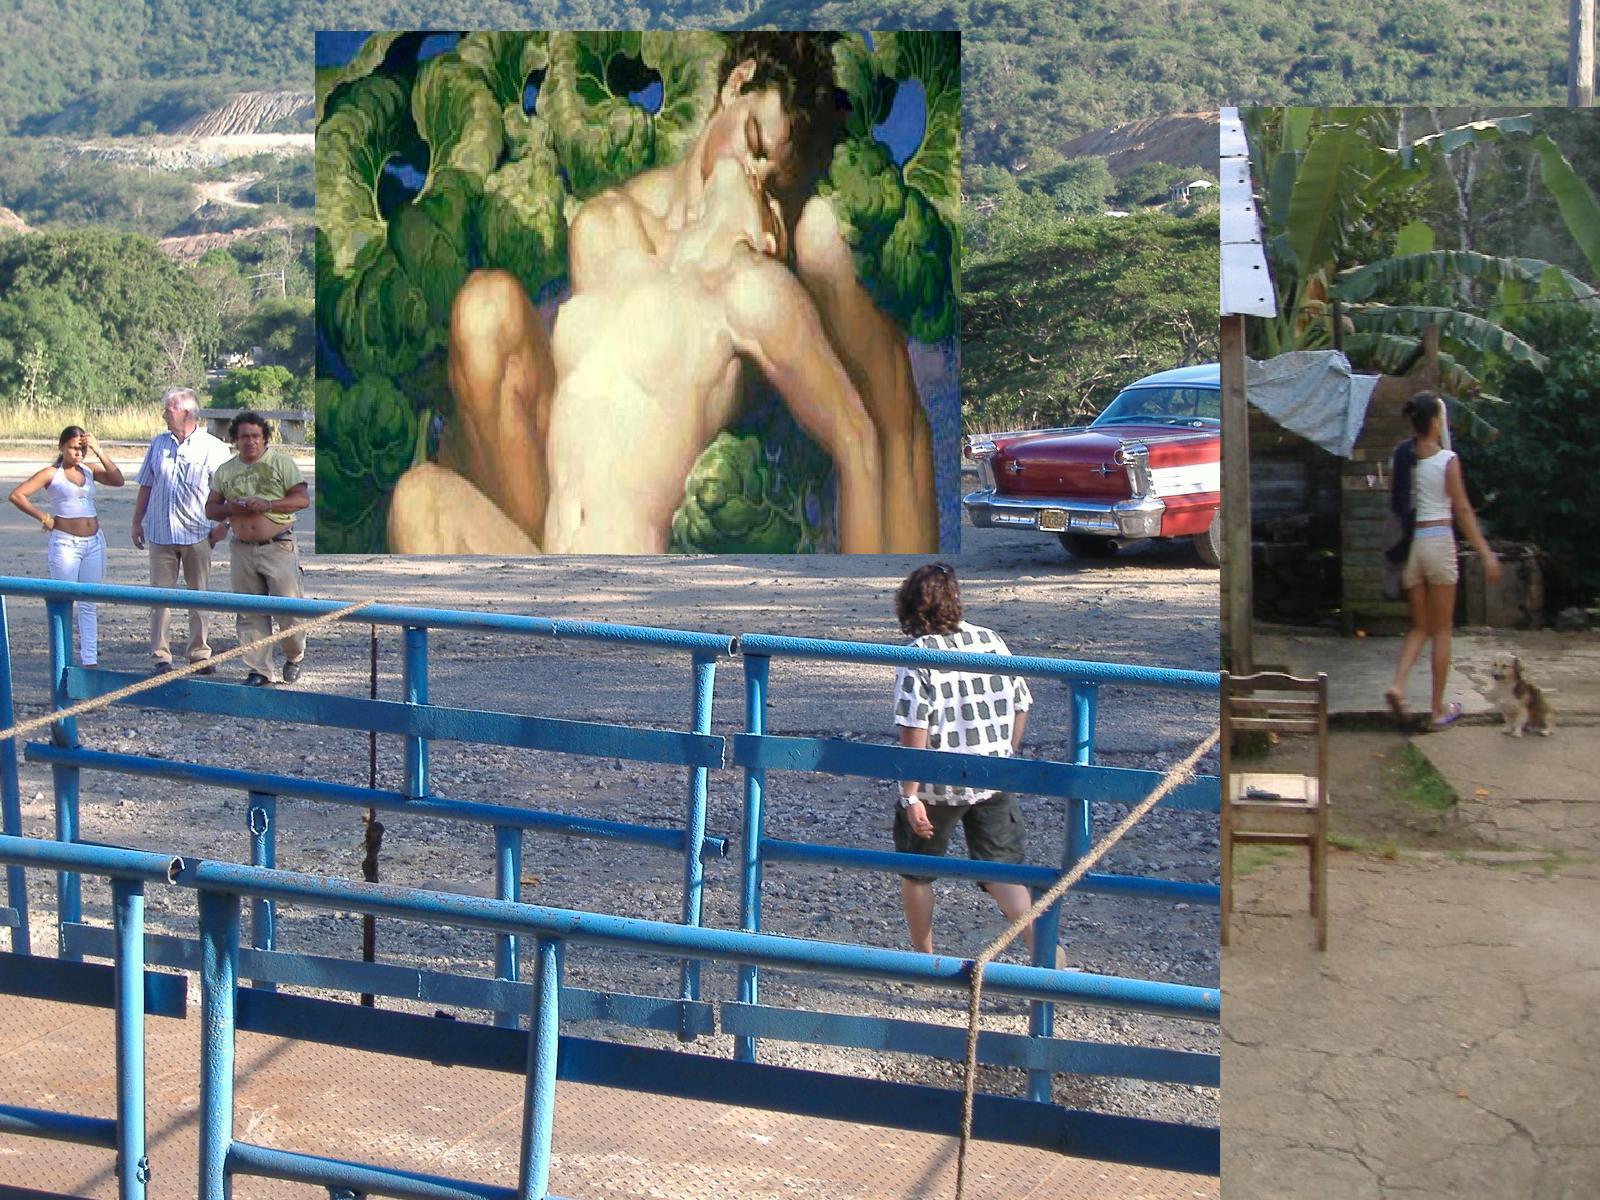 Fiesta blanca prostitutas prostitutas en hoznayo